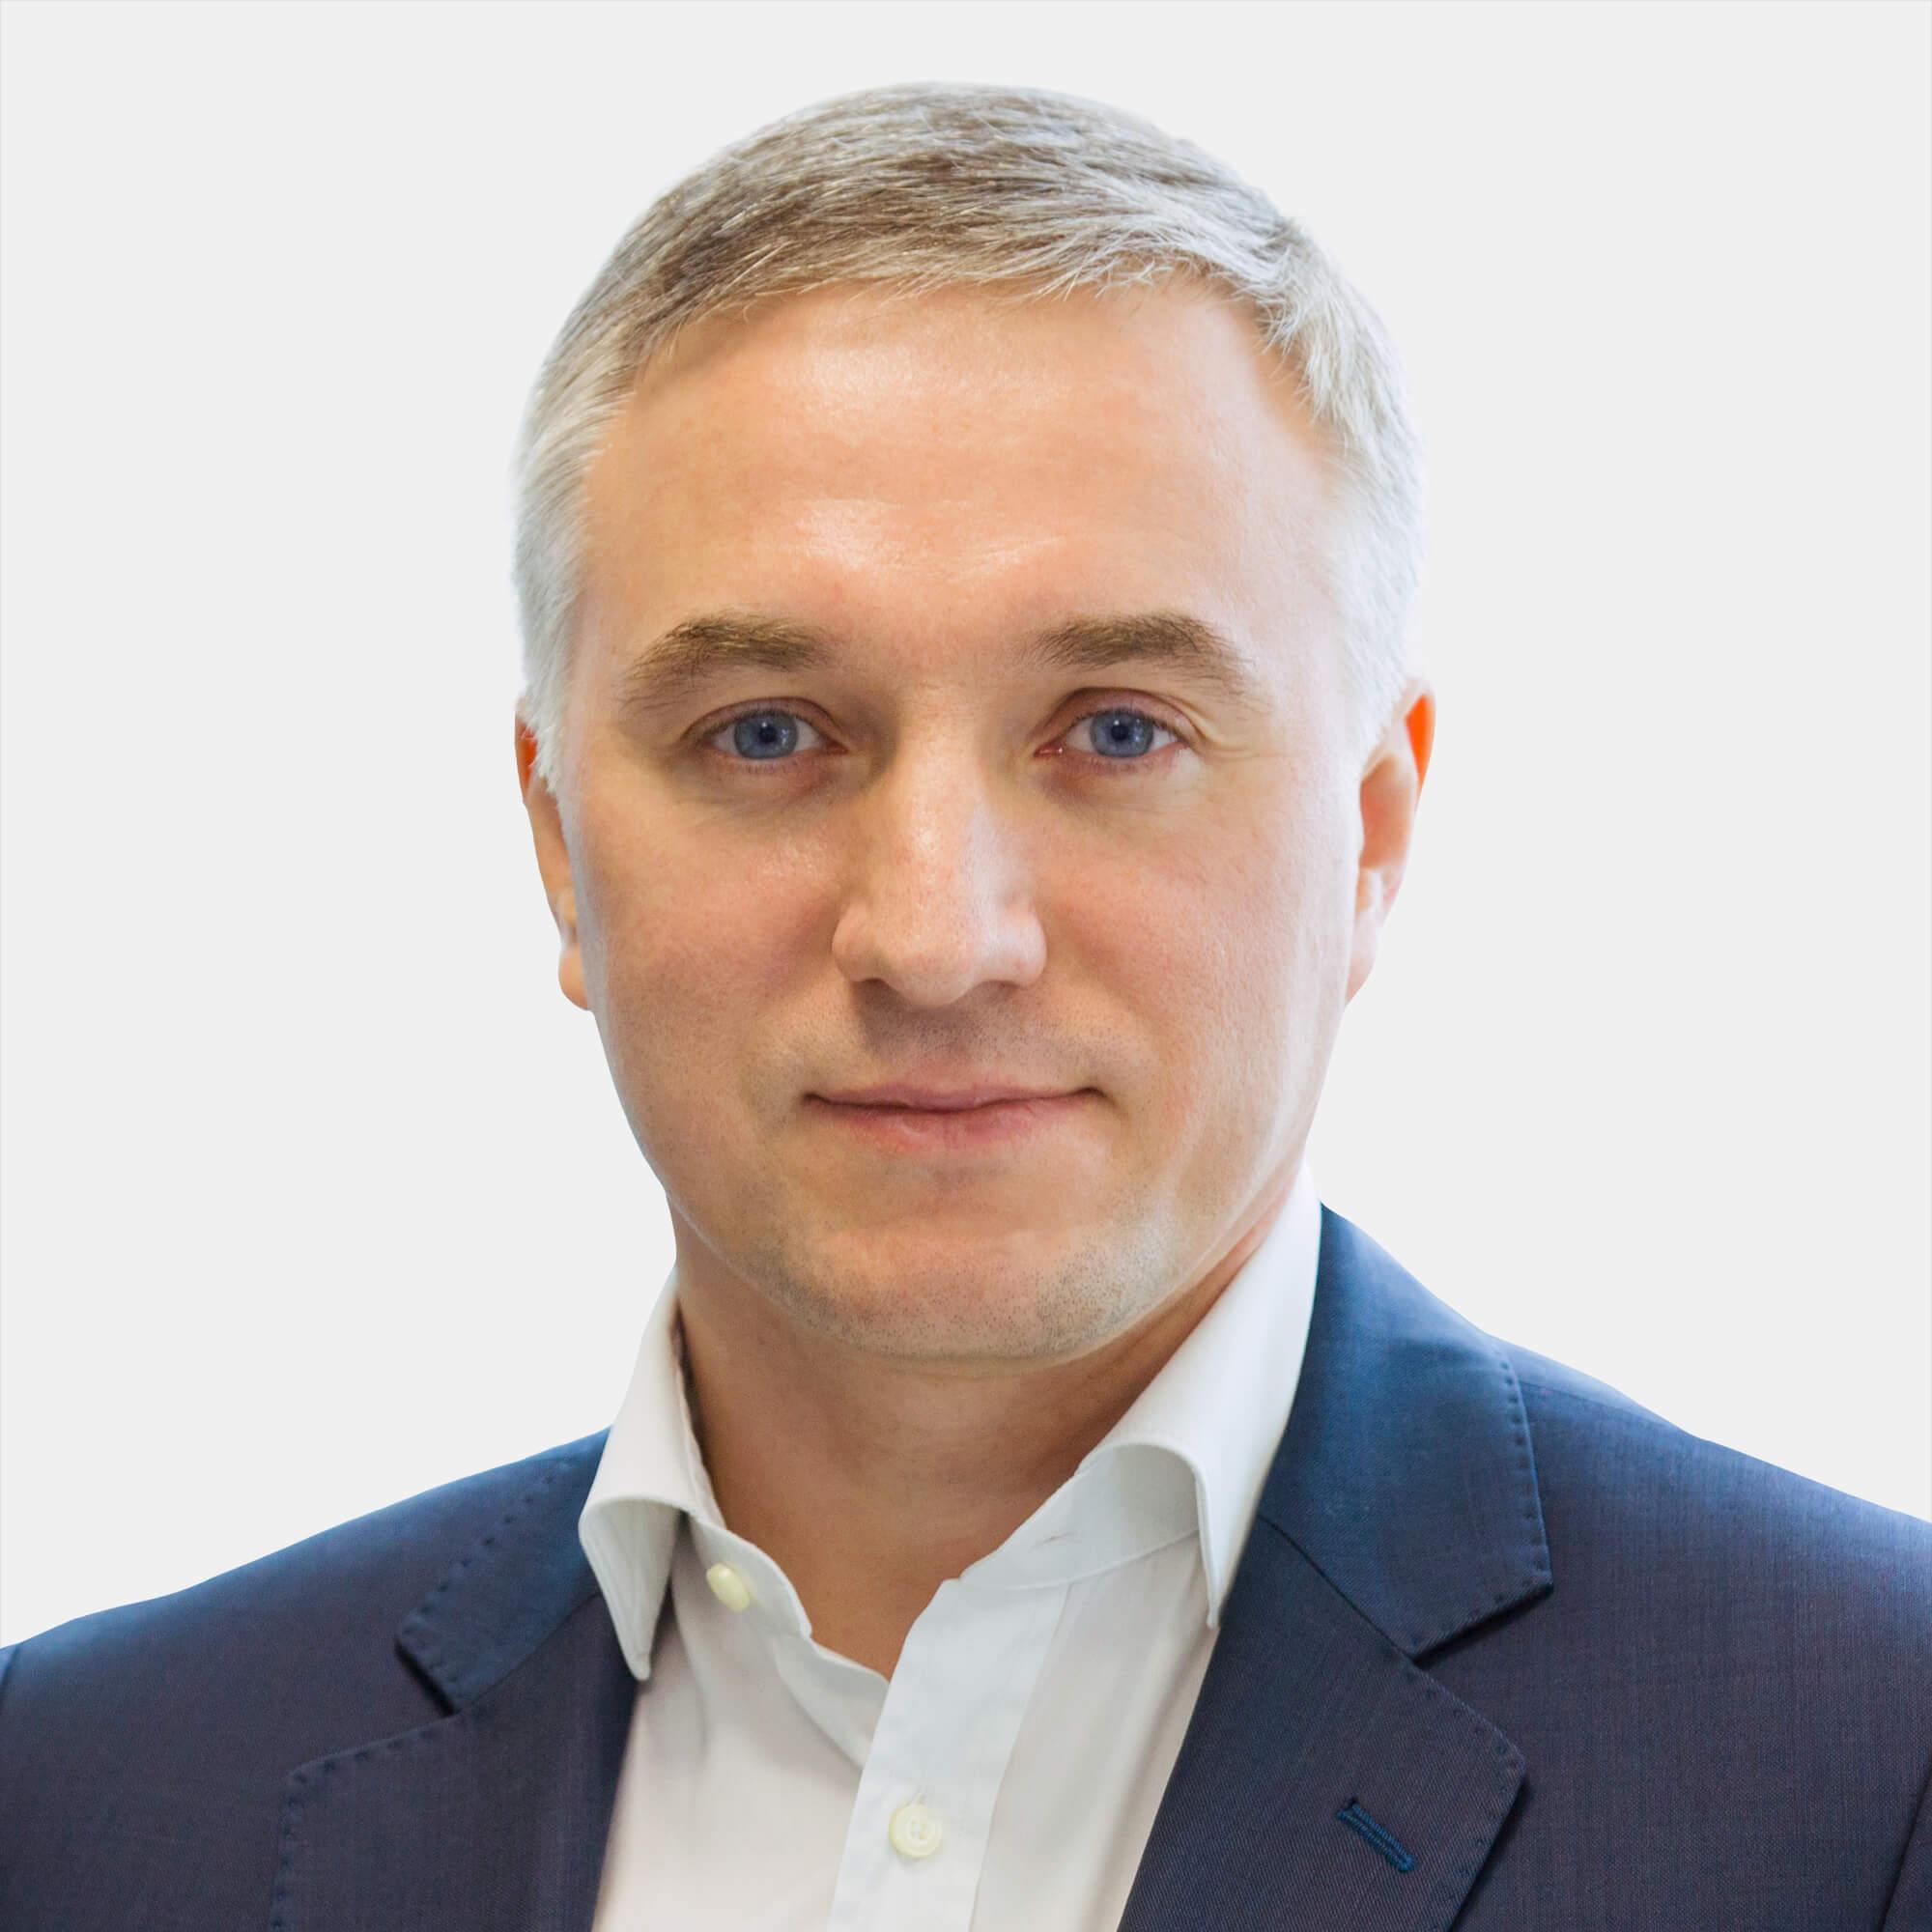 Dmitry Kaminskiy - Co-Founder, Head of International Development